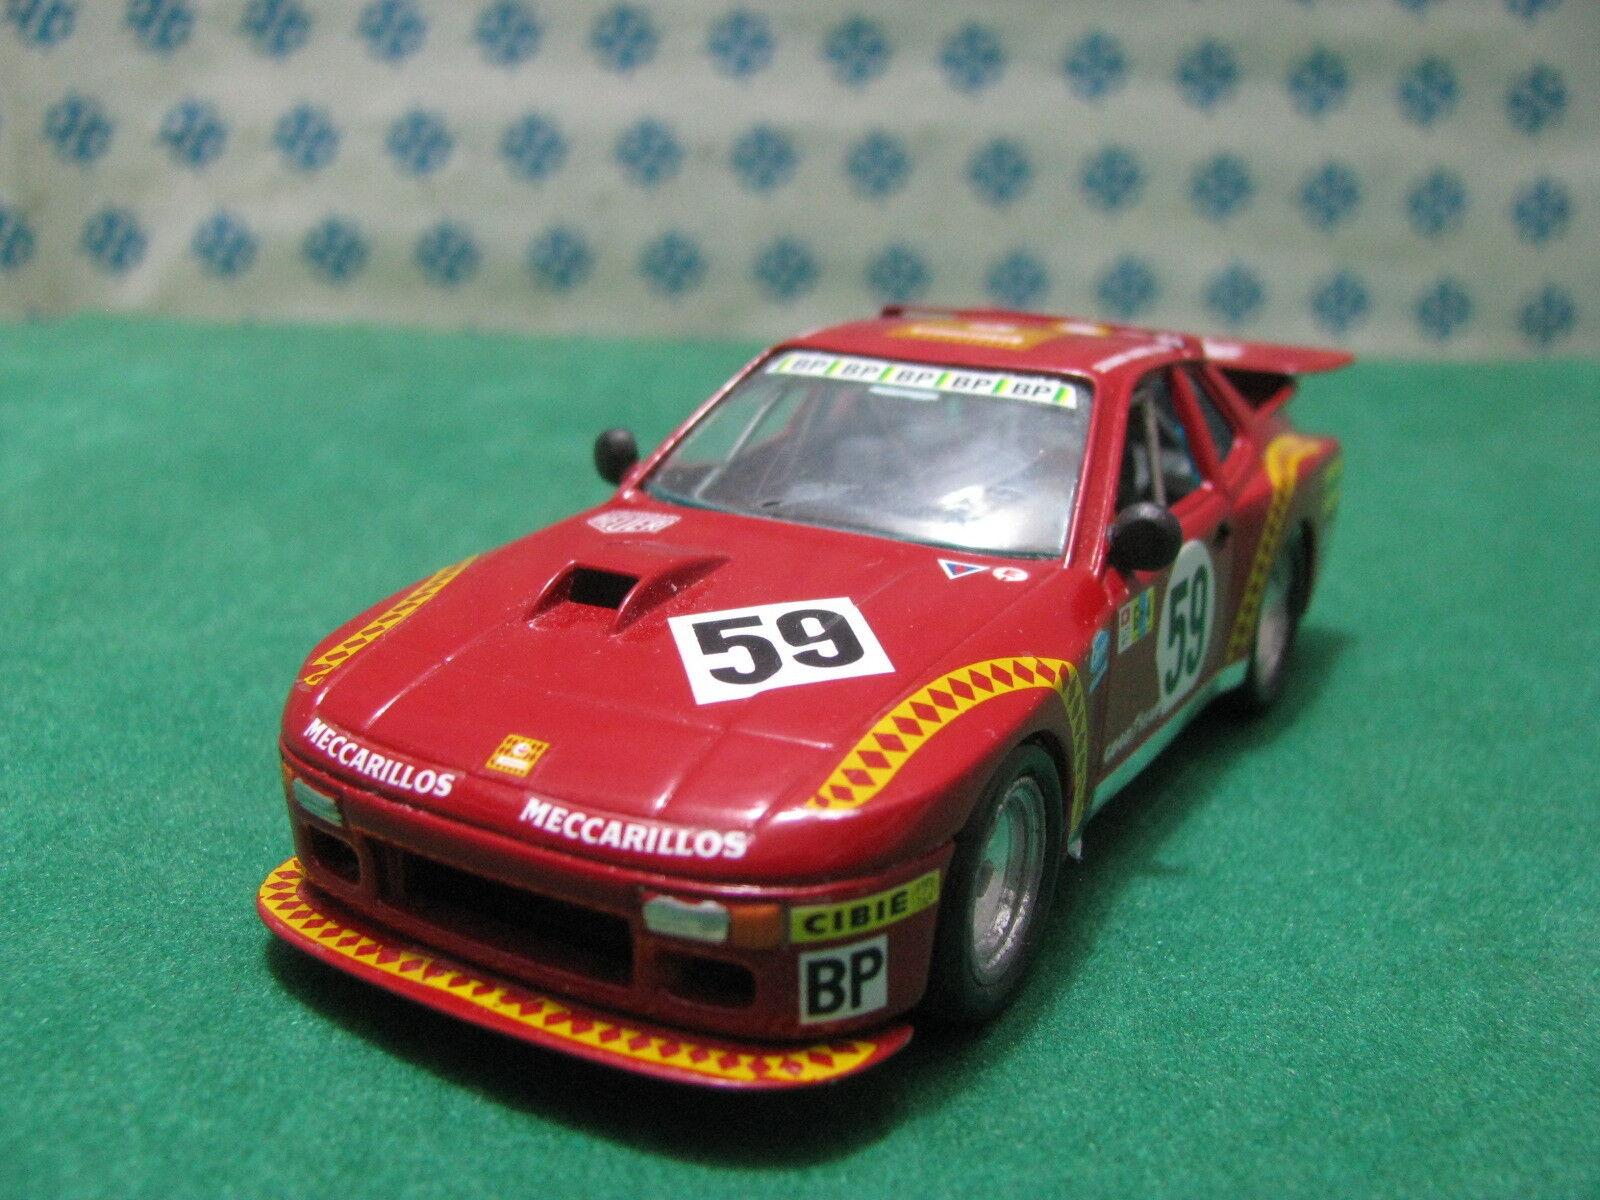 PORSCE  924  Turbo  Scuderia Mecarillos  - 1 43  Kit  Artigianale